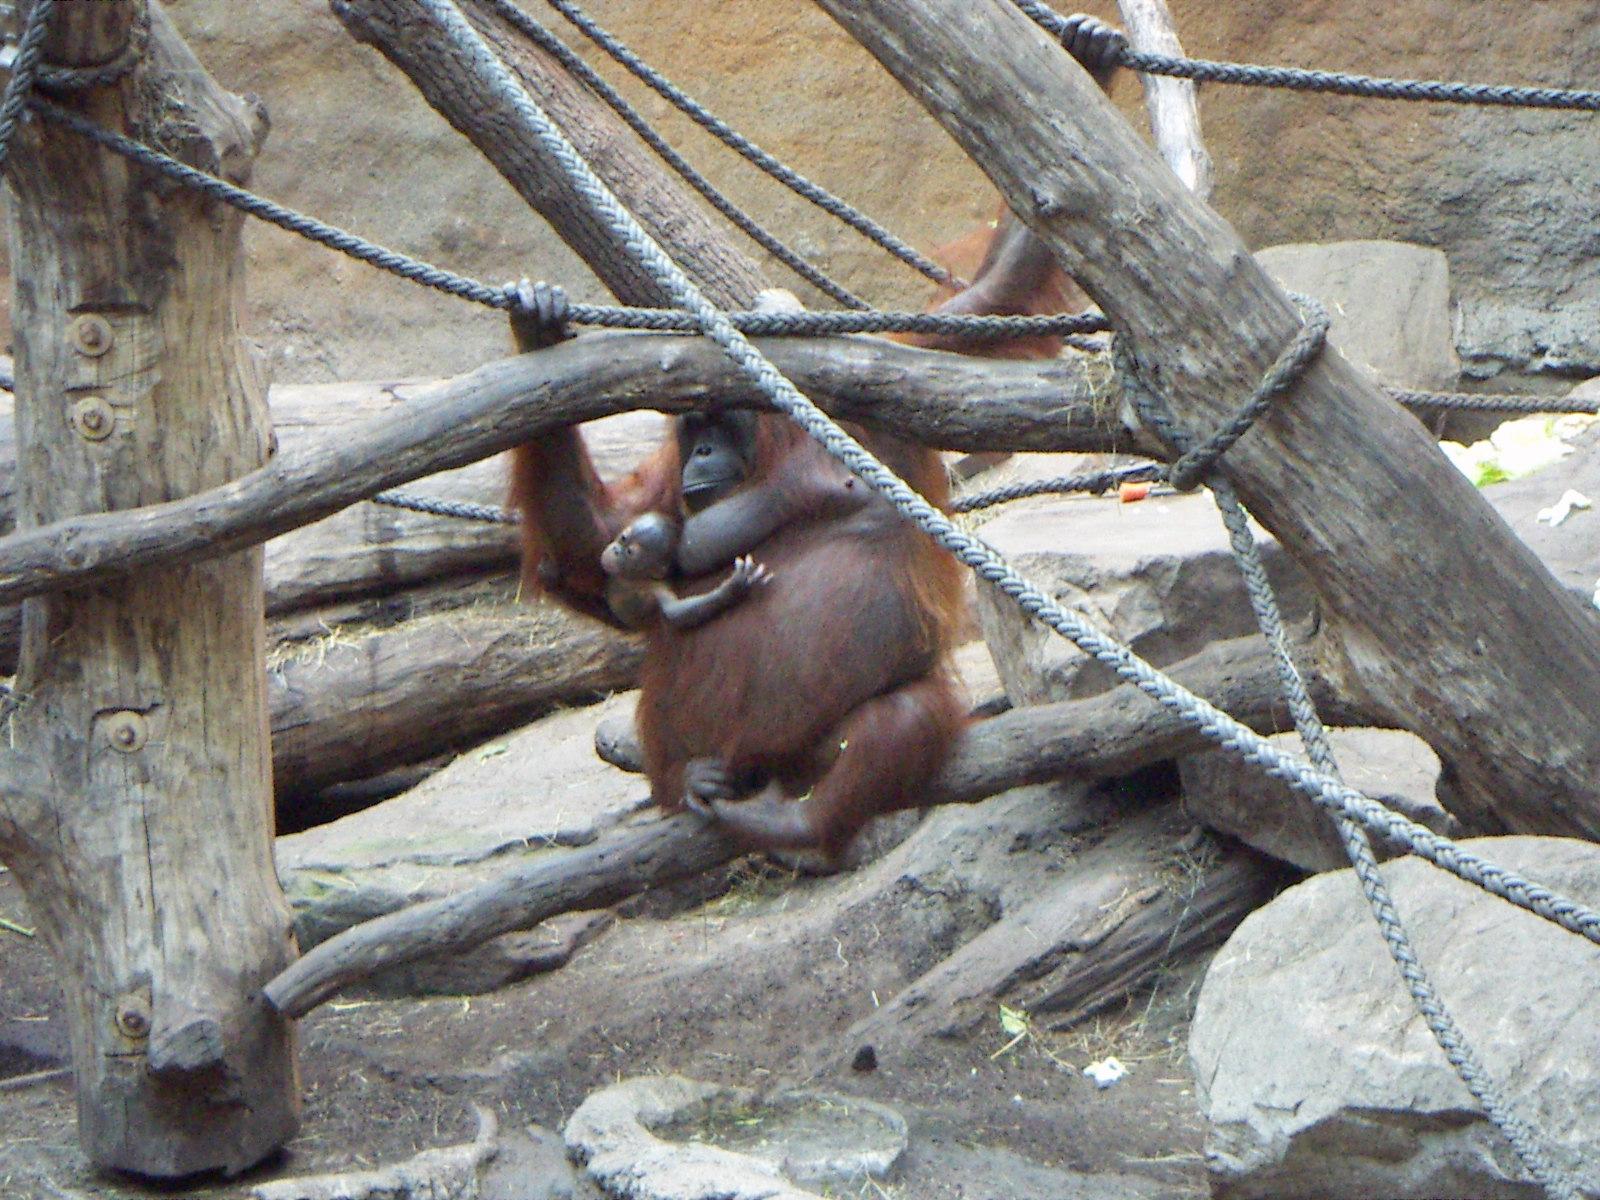 Description orang-utan-baby muenster